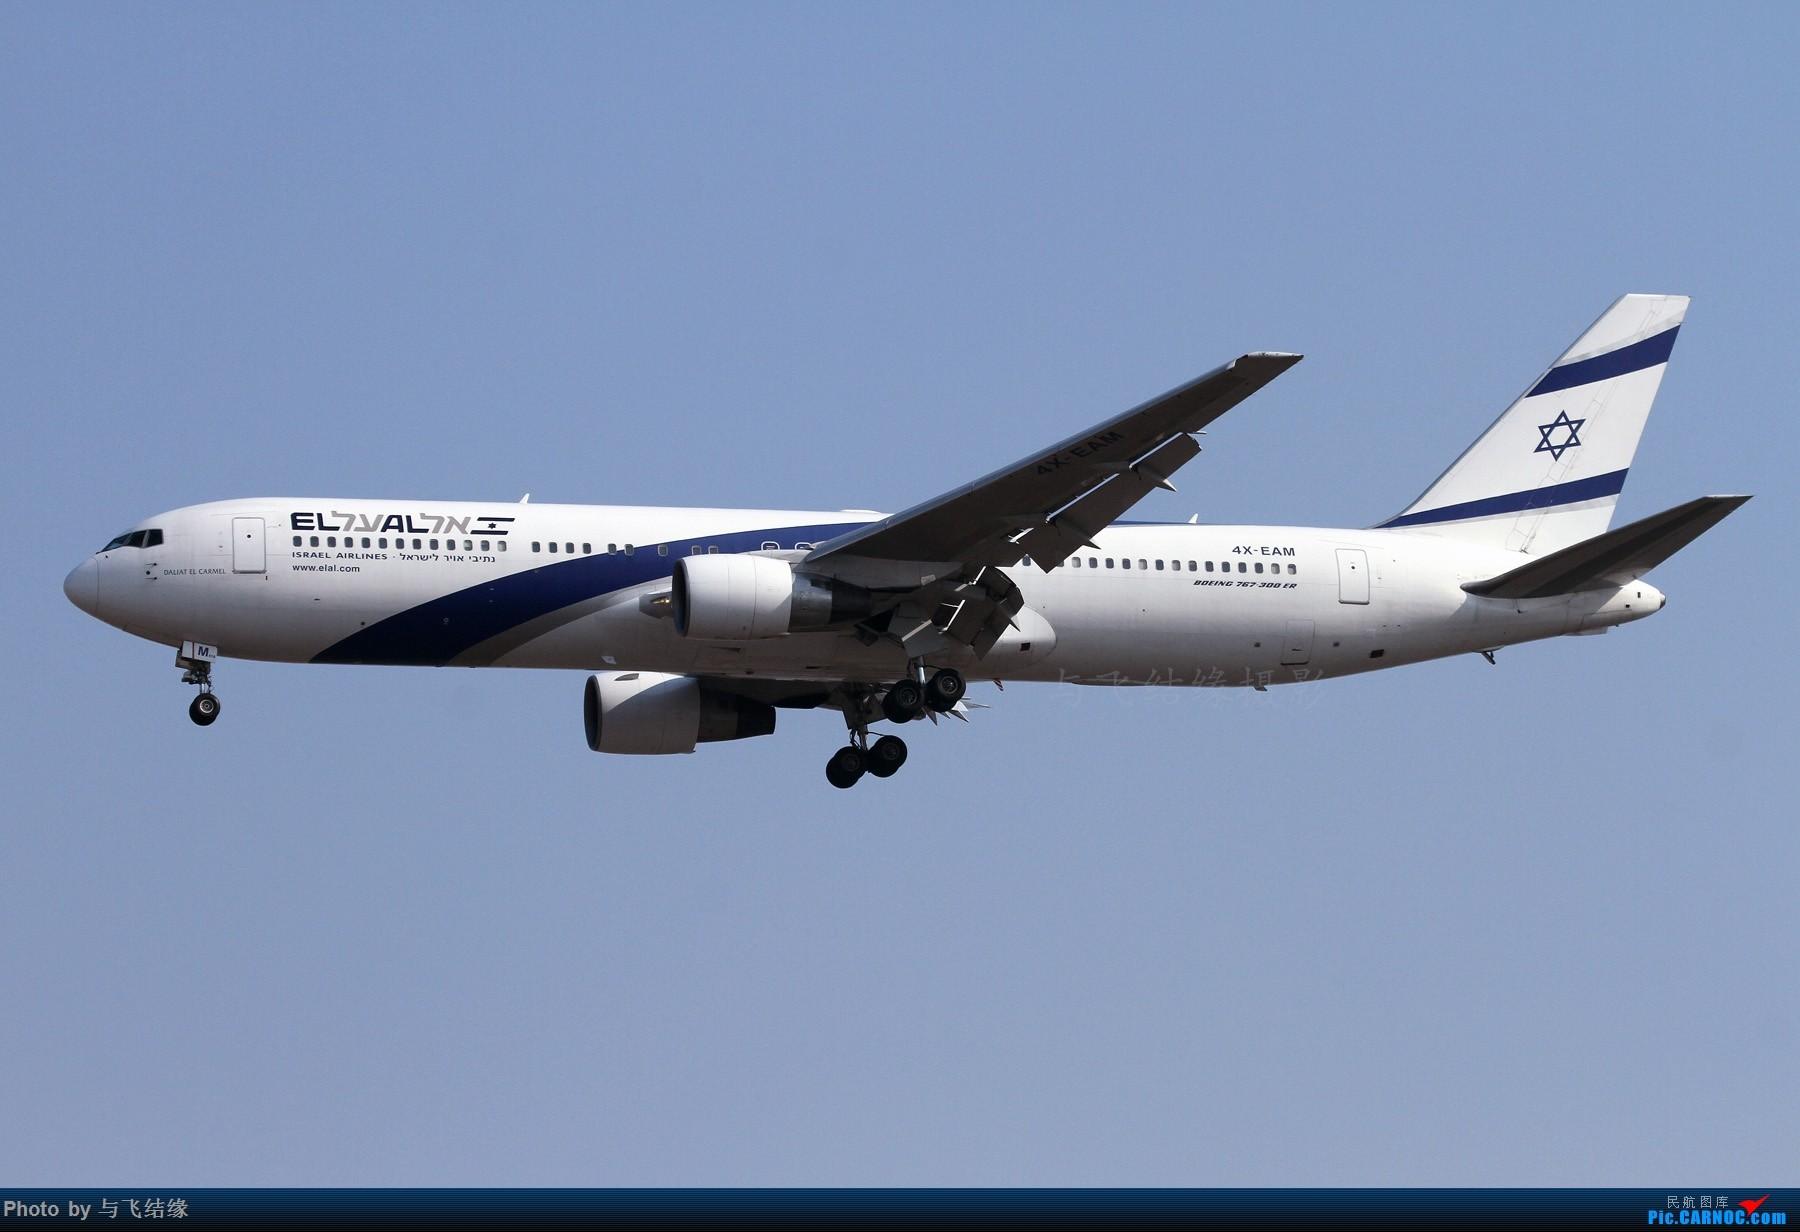 Re:[原创]荷航,以色列航,加航! BOEING 767-300ER 4X-EAM 中国北京首都国际机场